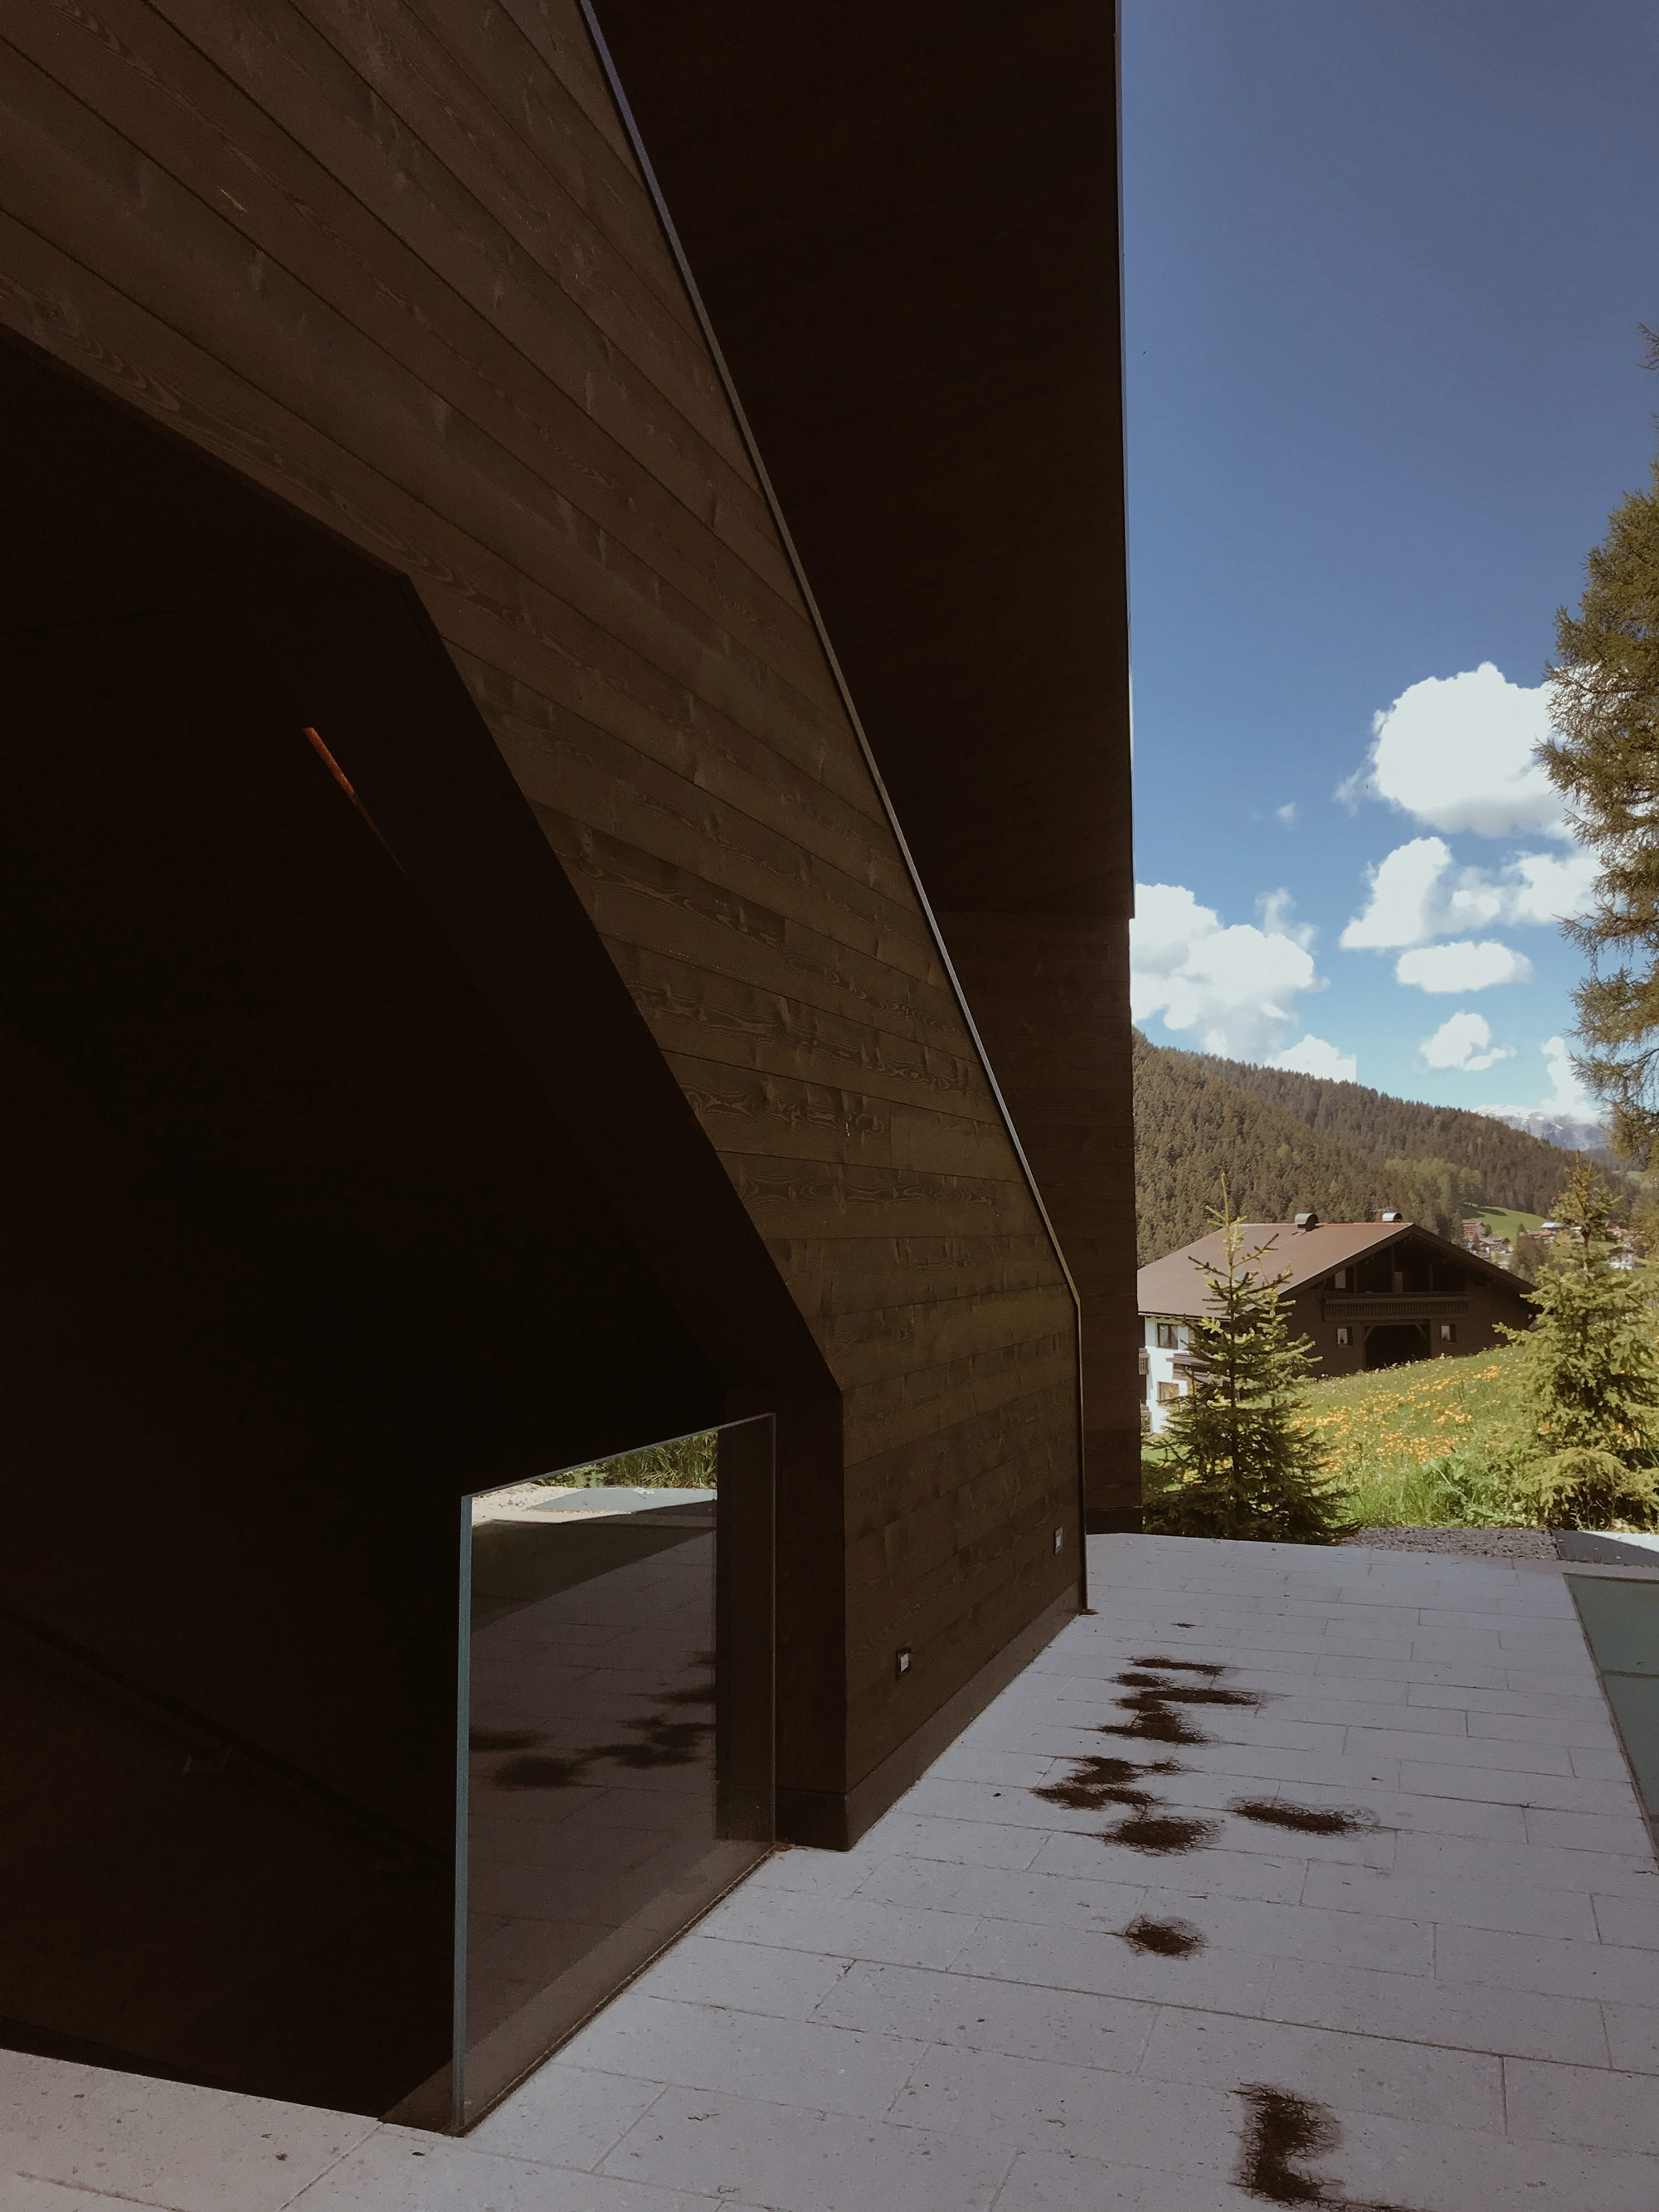 Architekturtage Südtirol - www.lesfactoryfemmes.com